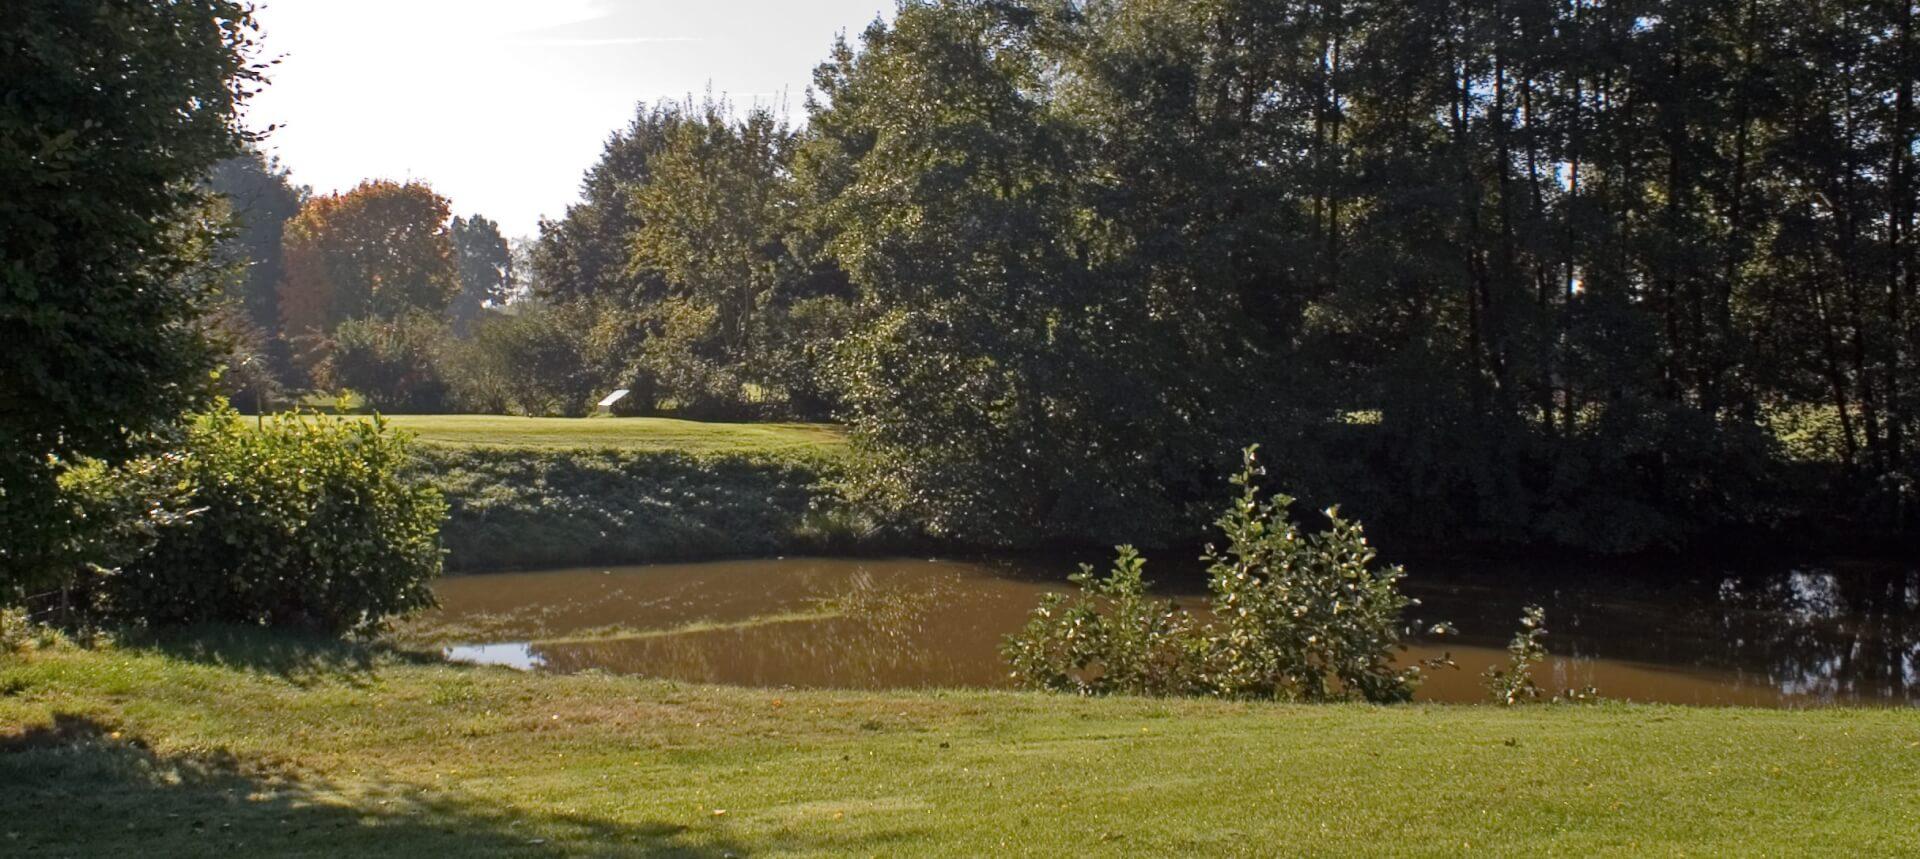 https://golfclub-peckeloh.de/wp-content/uploads/2018/02/PICT0251-1-e1519813920782.jpg